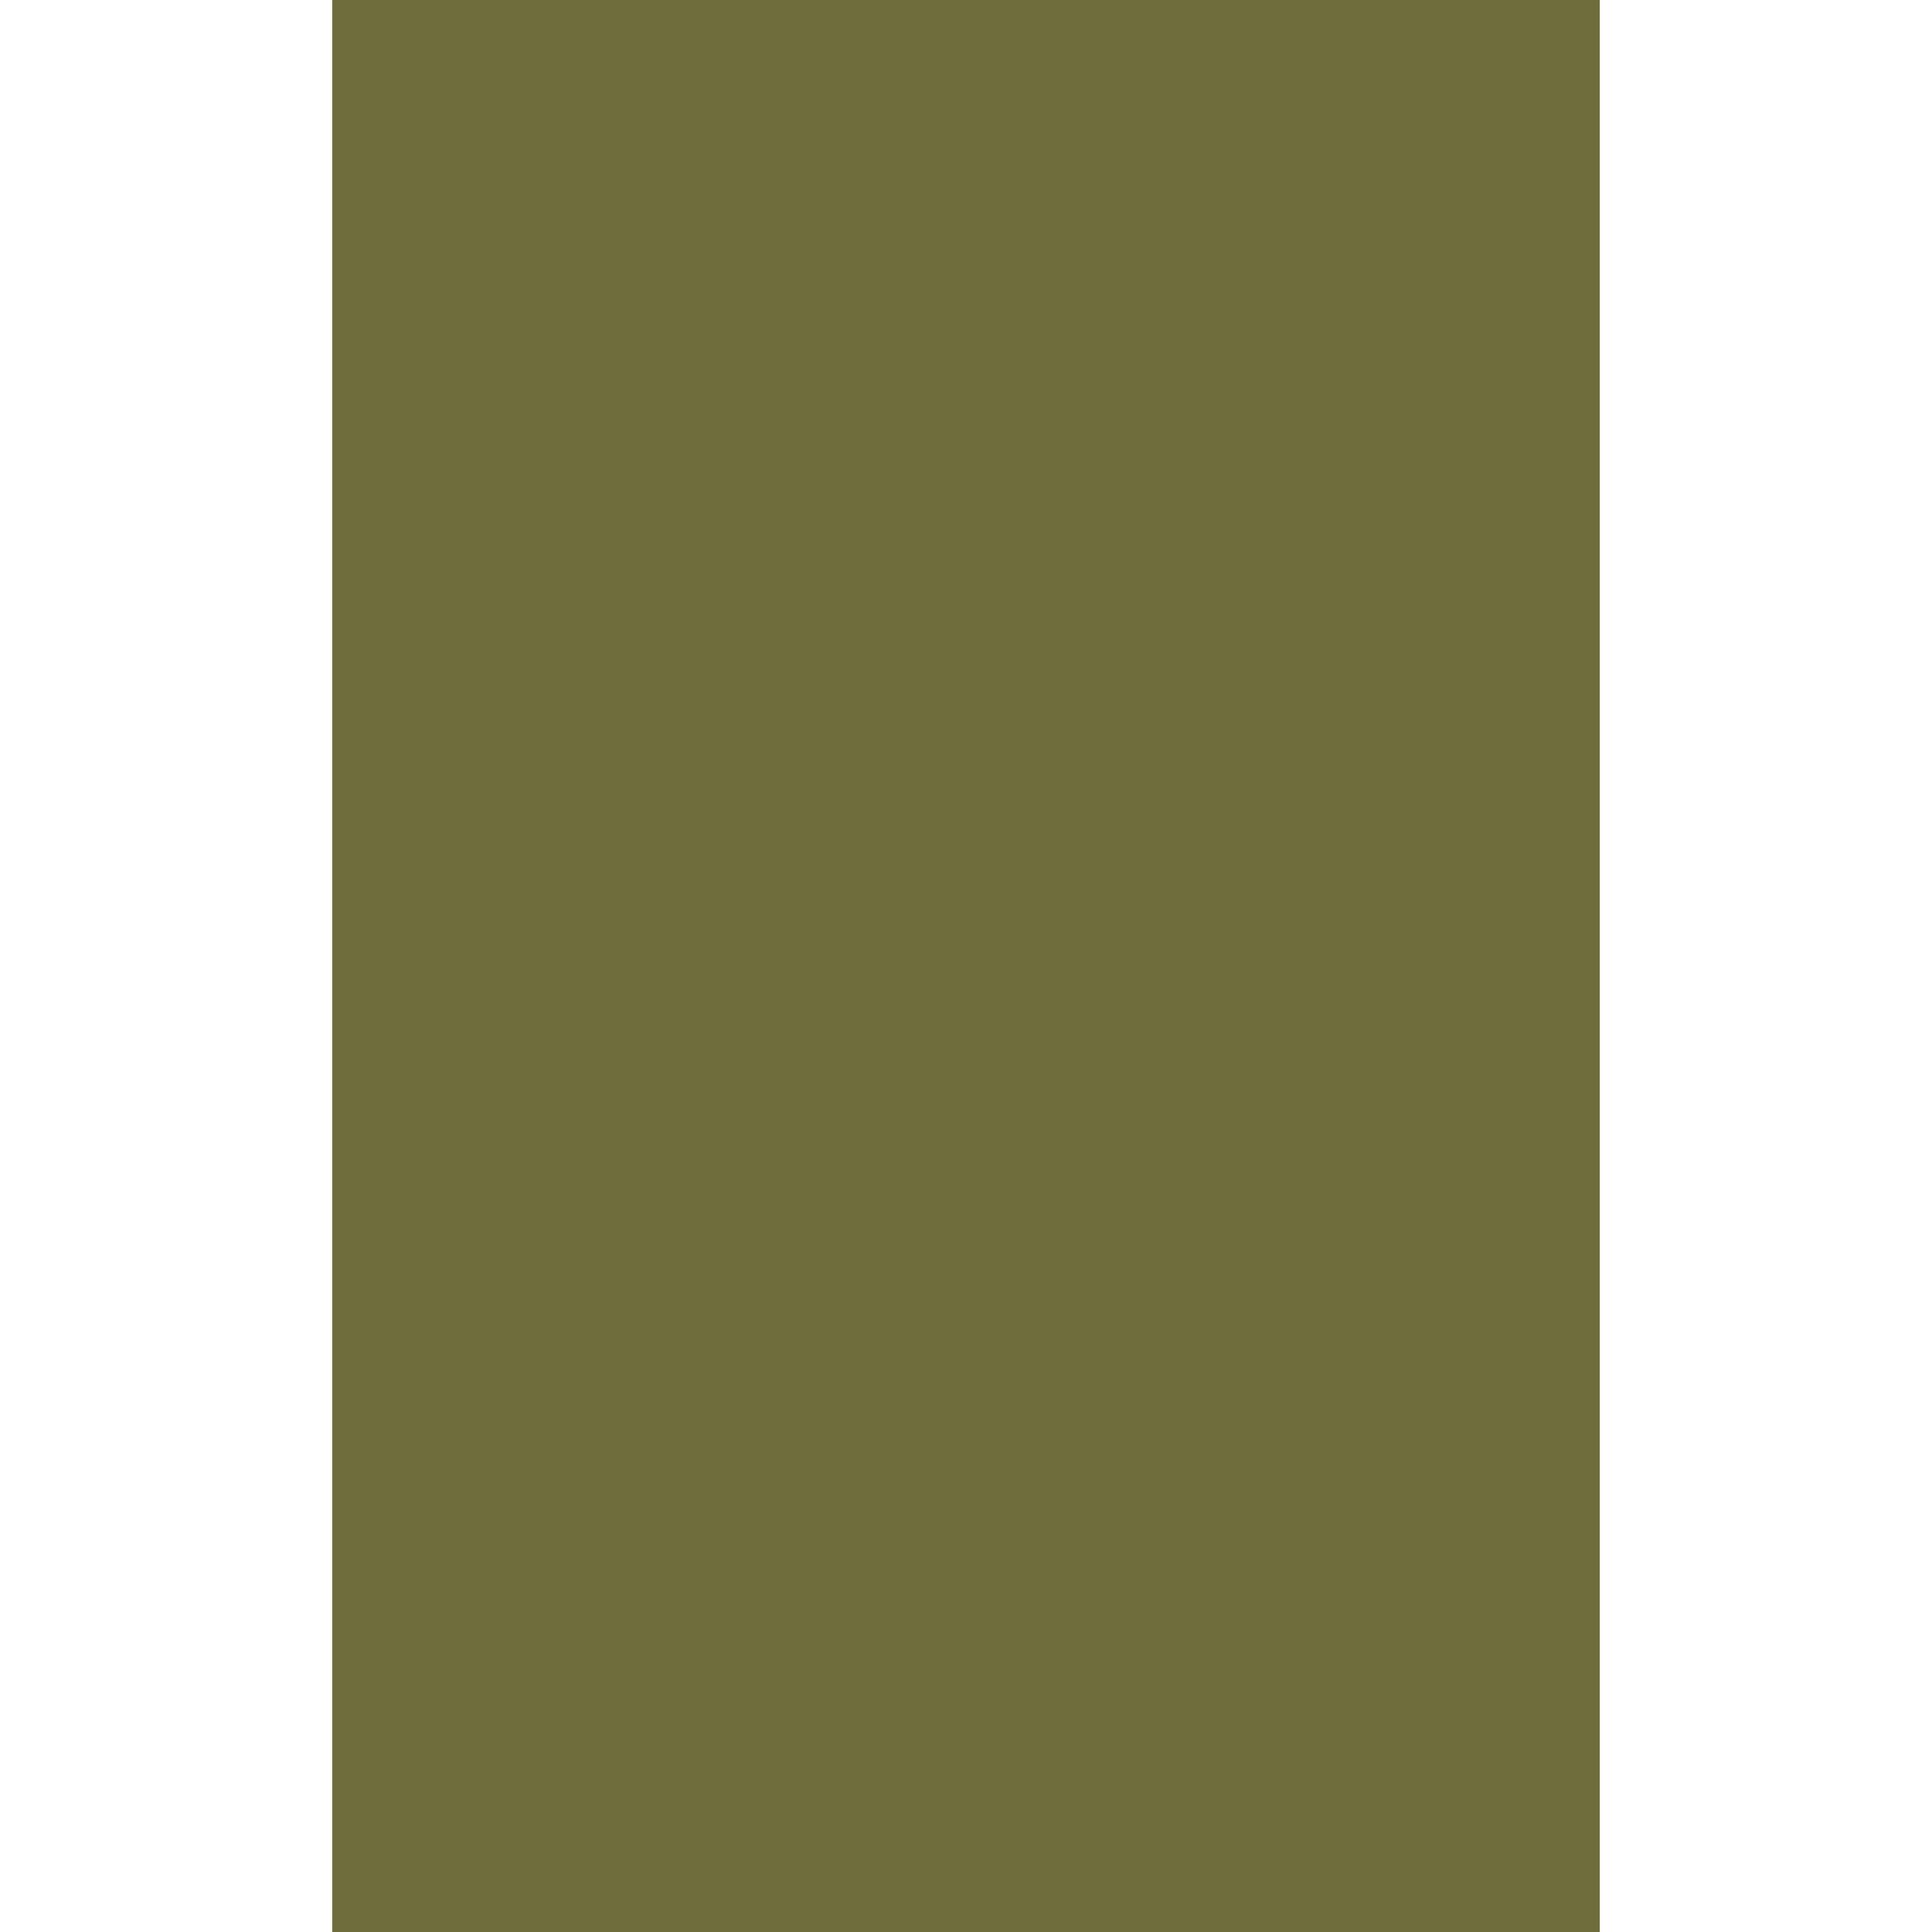 Koppel Hand-Woven Dark Green/Khaki Area Rug Rug Size: Round 8'